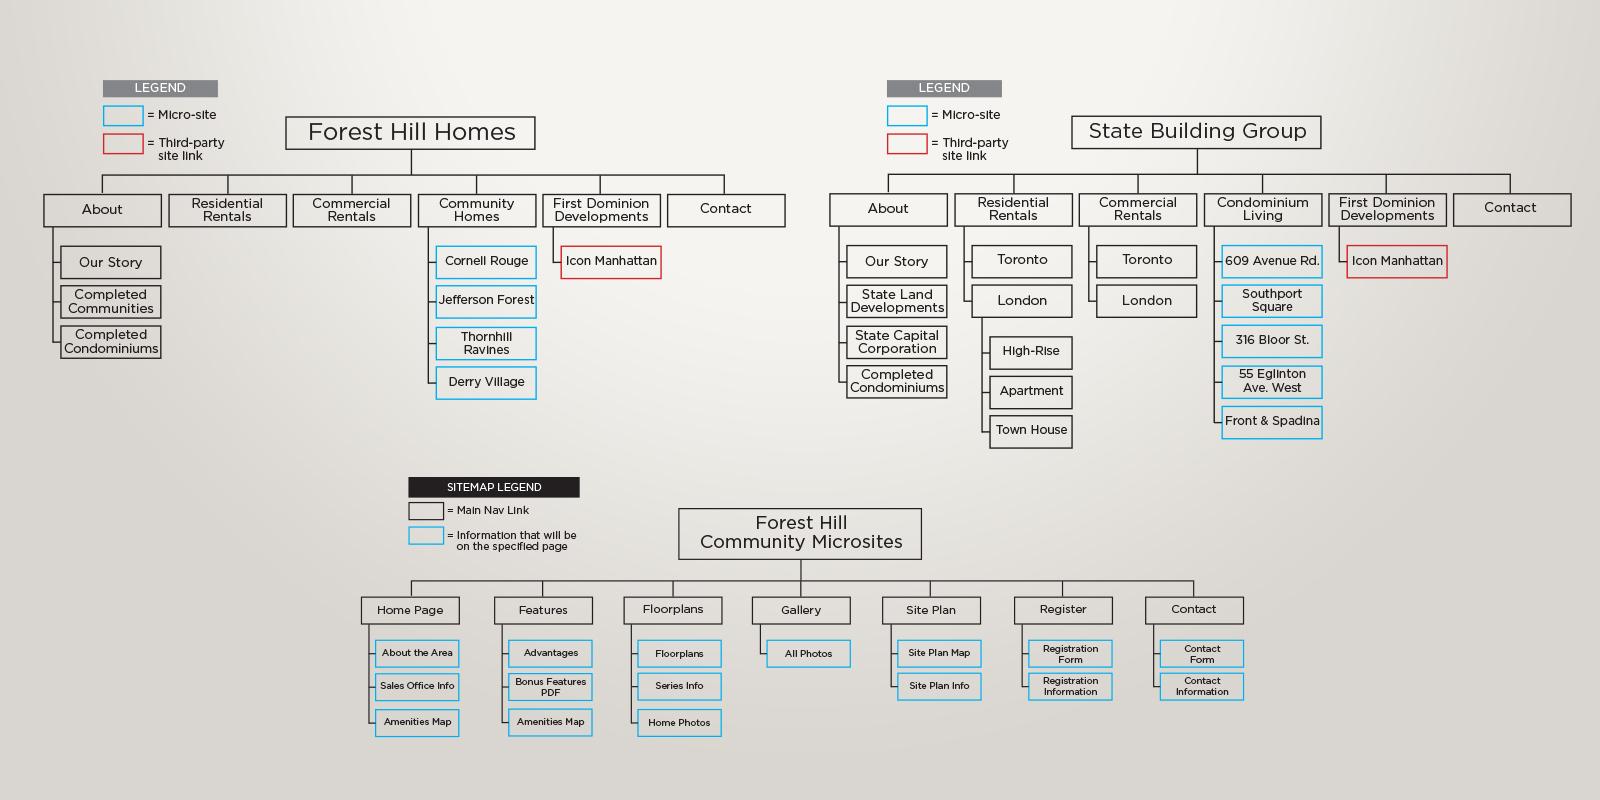 FHH & SBG Sitemaps